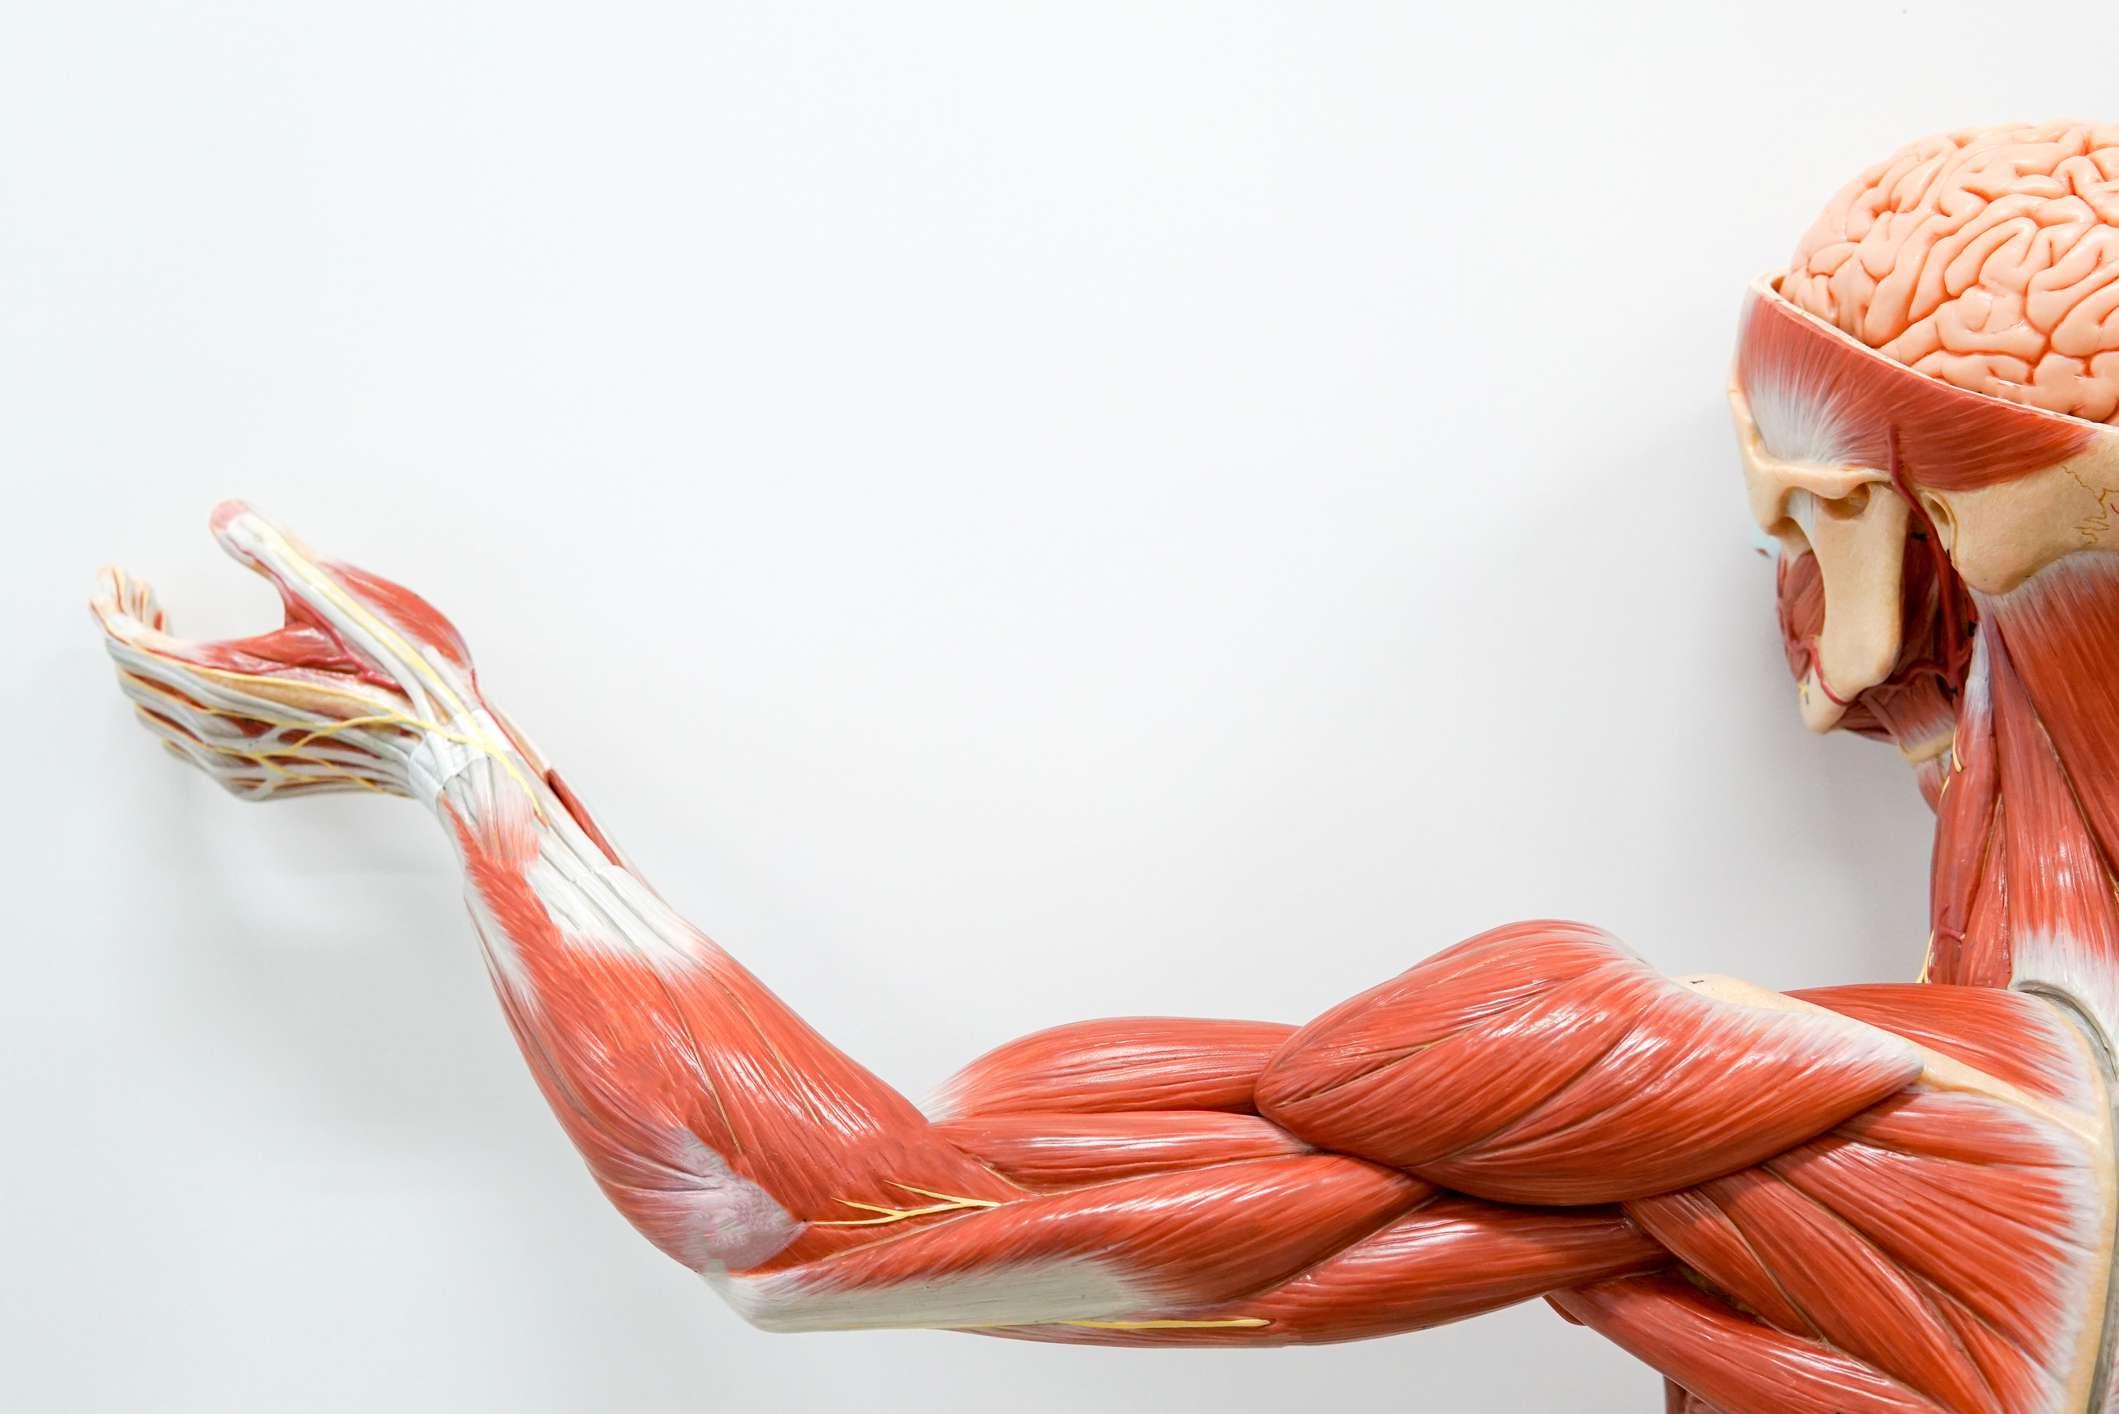 arm muscle anatomy